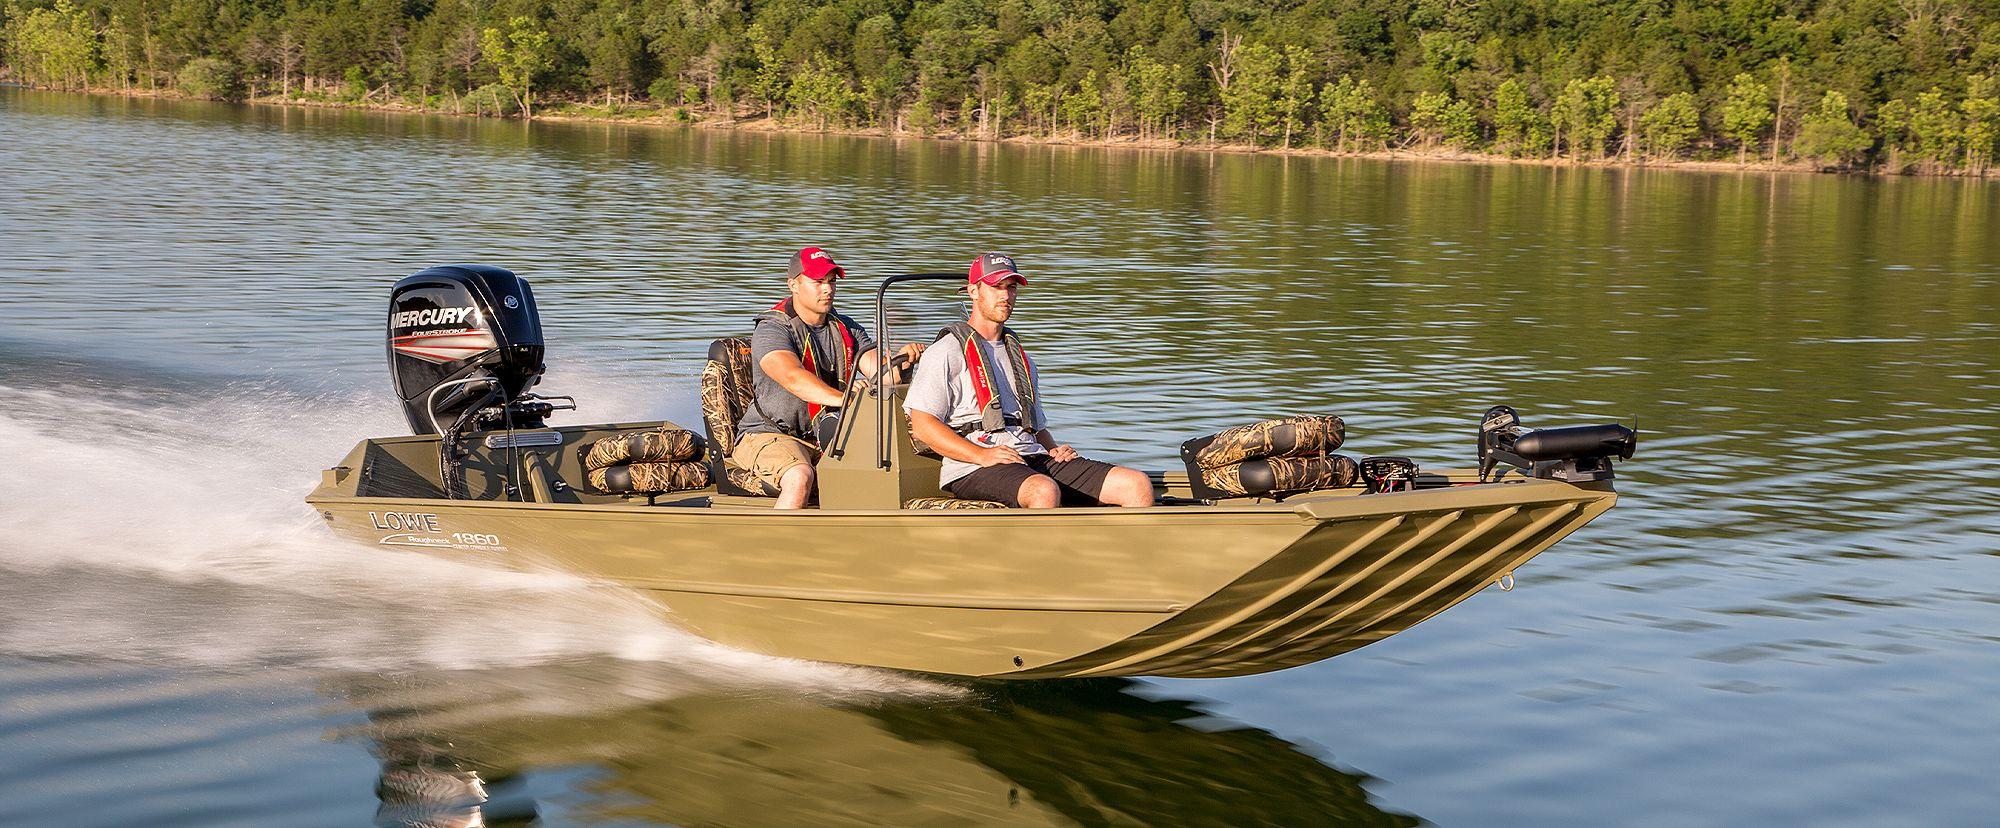 Lowe Boats RX18TN Hero Image